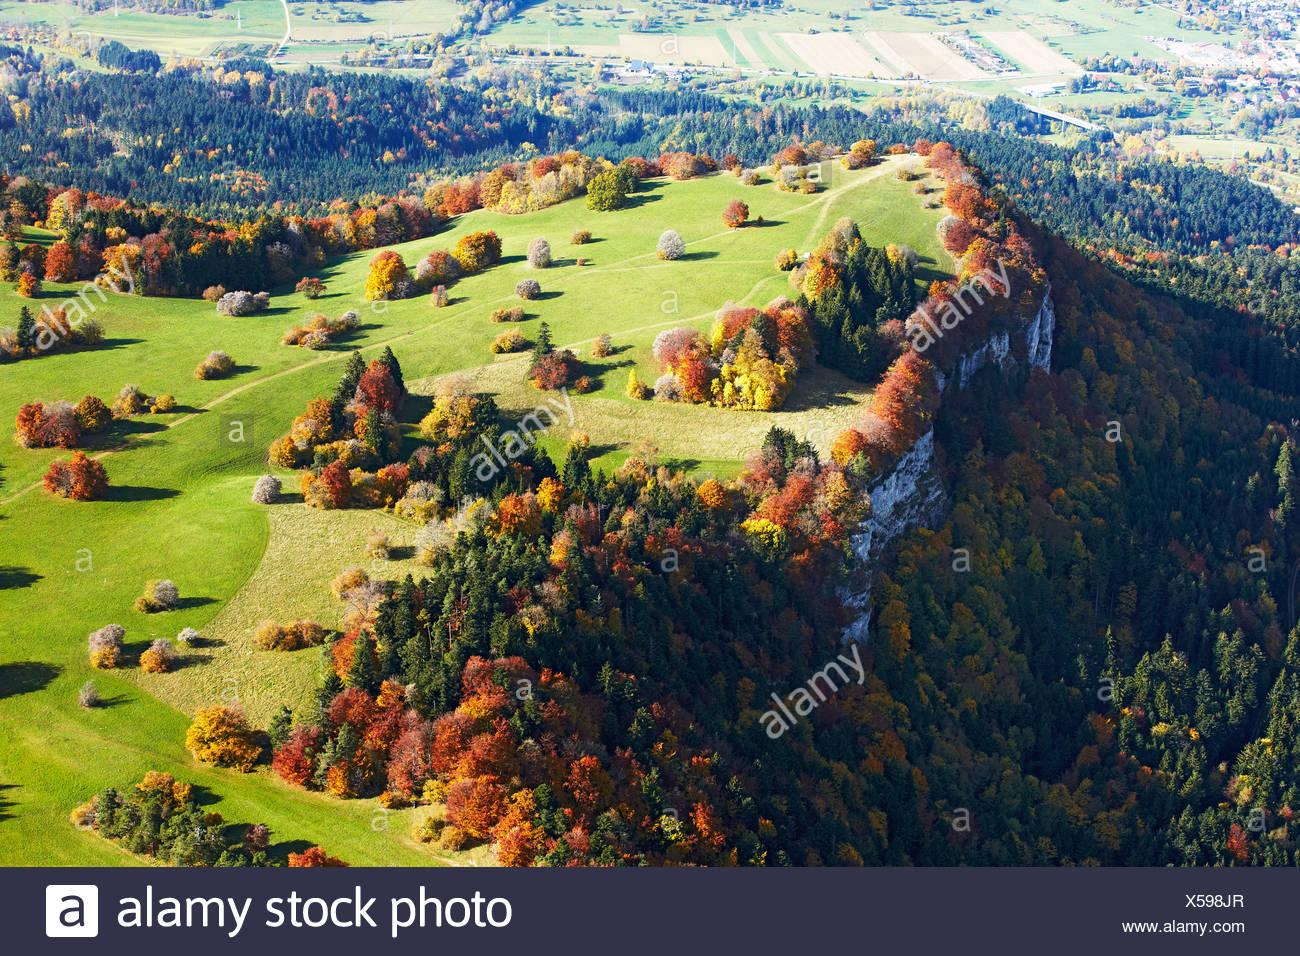 Escarpment of the Swabian Jura, Baden-Wuerttemberg, Germany, aerial photo - Stock Image